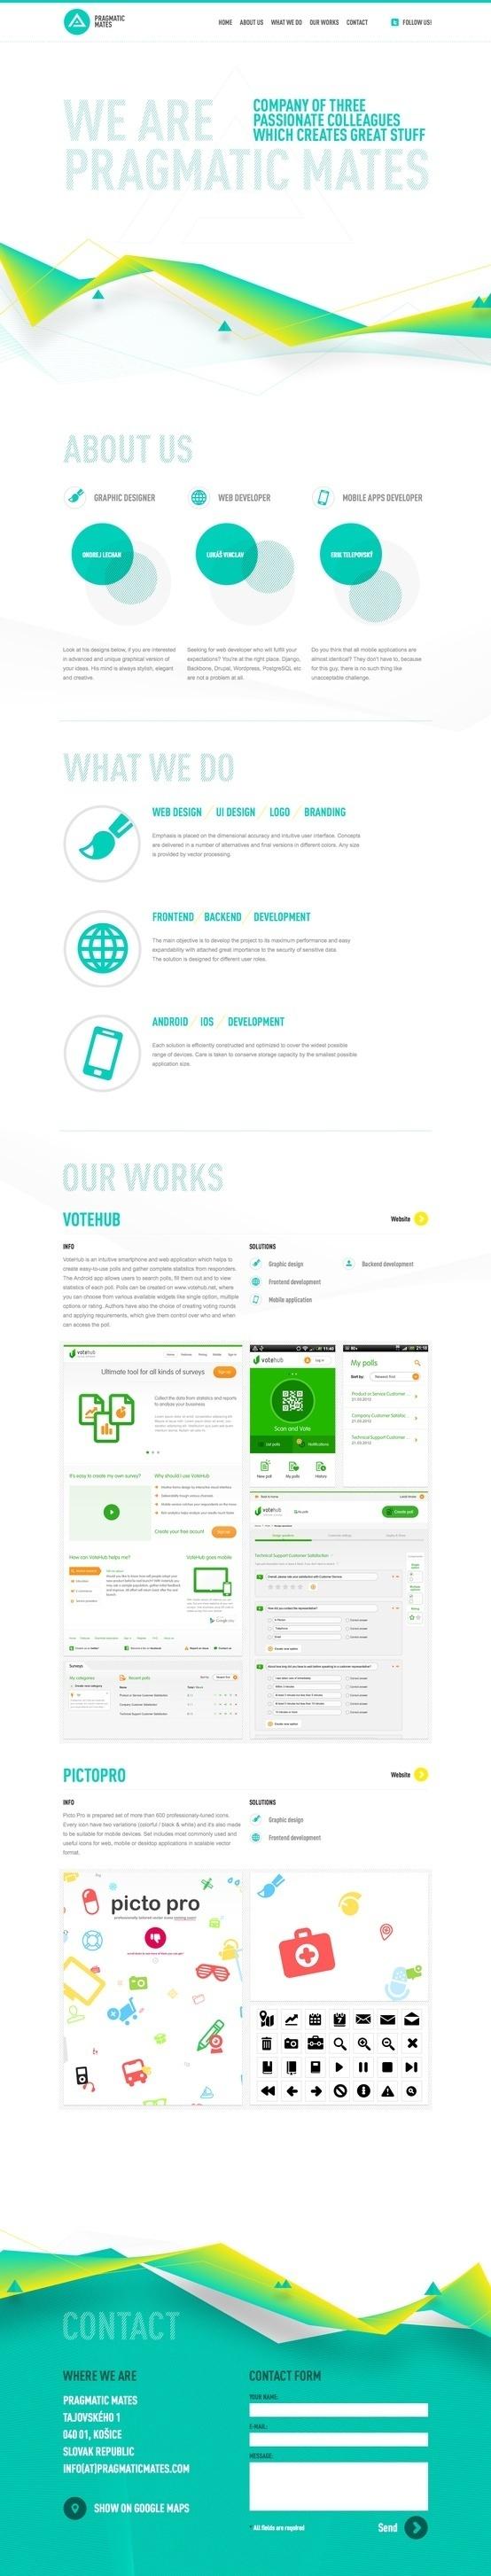 Pragmatic Mates Website Design #design #website #blue #web #green